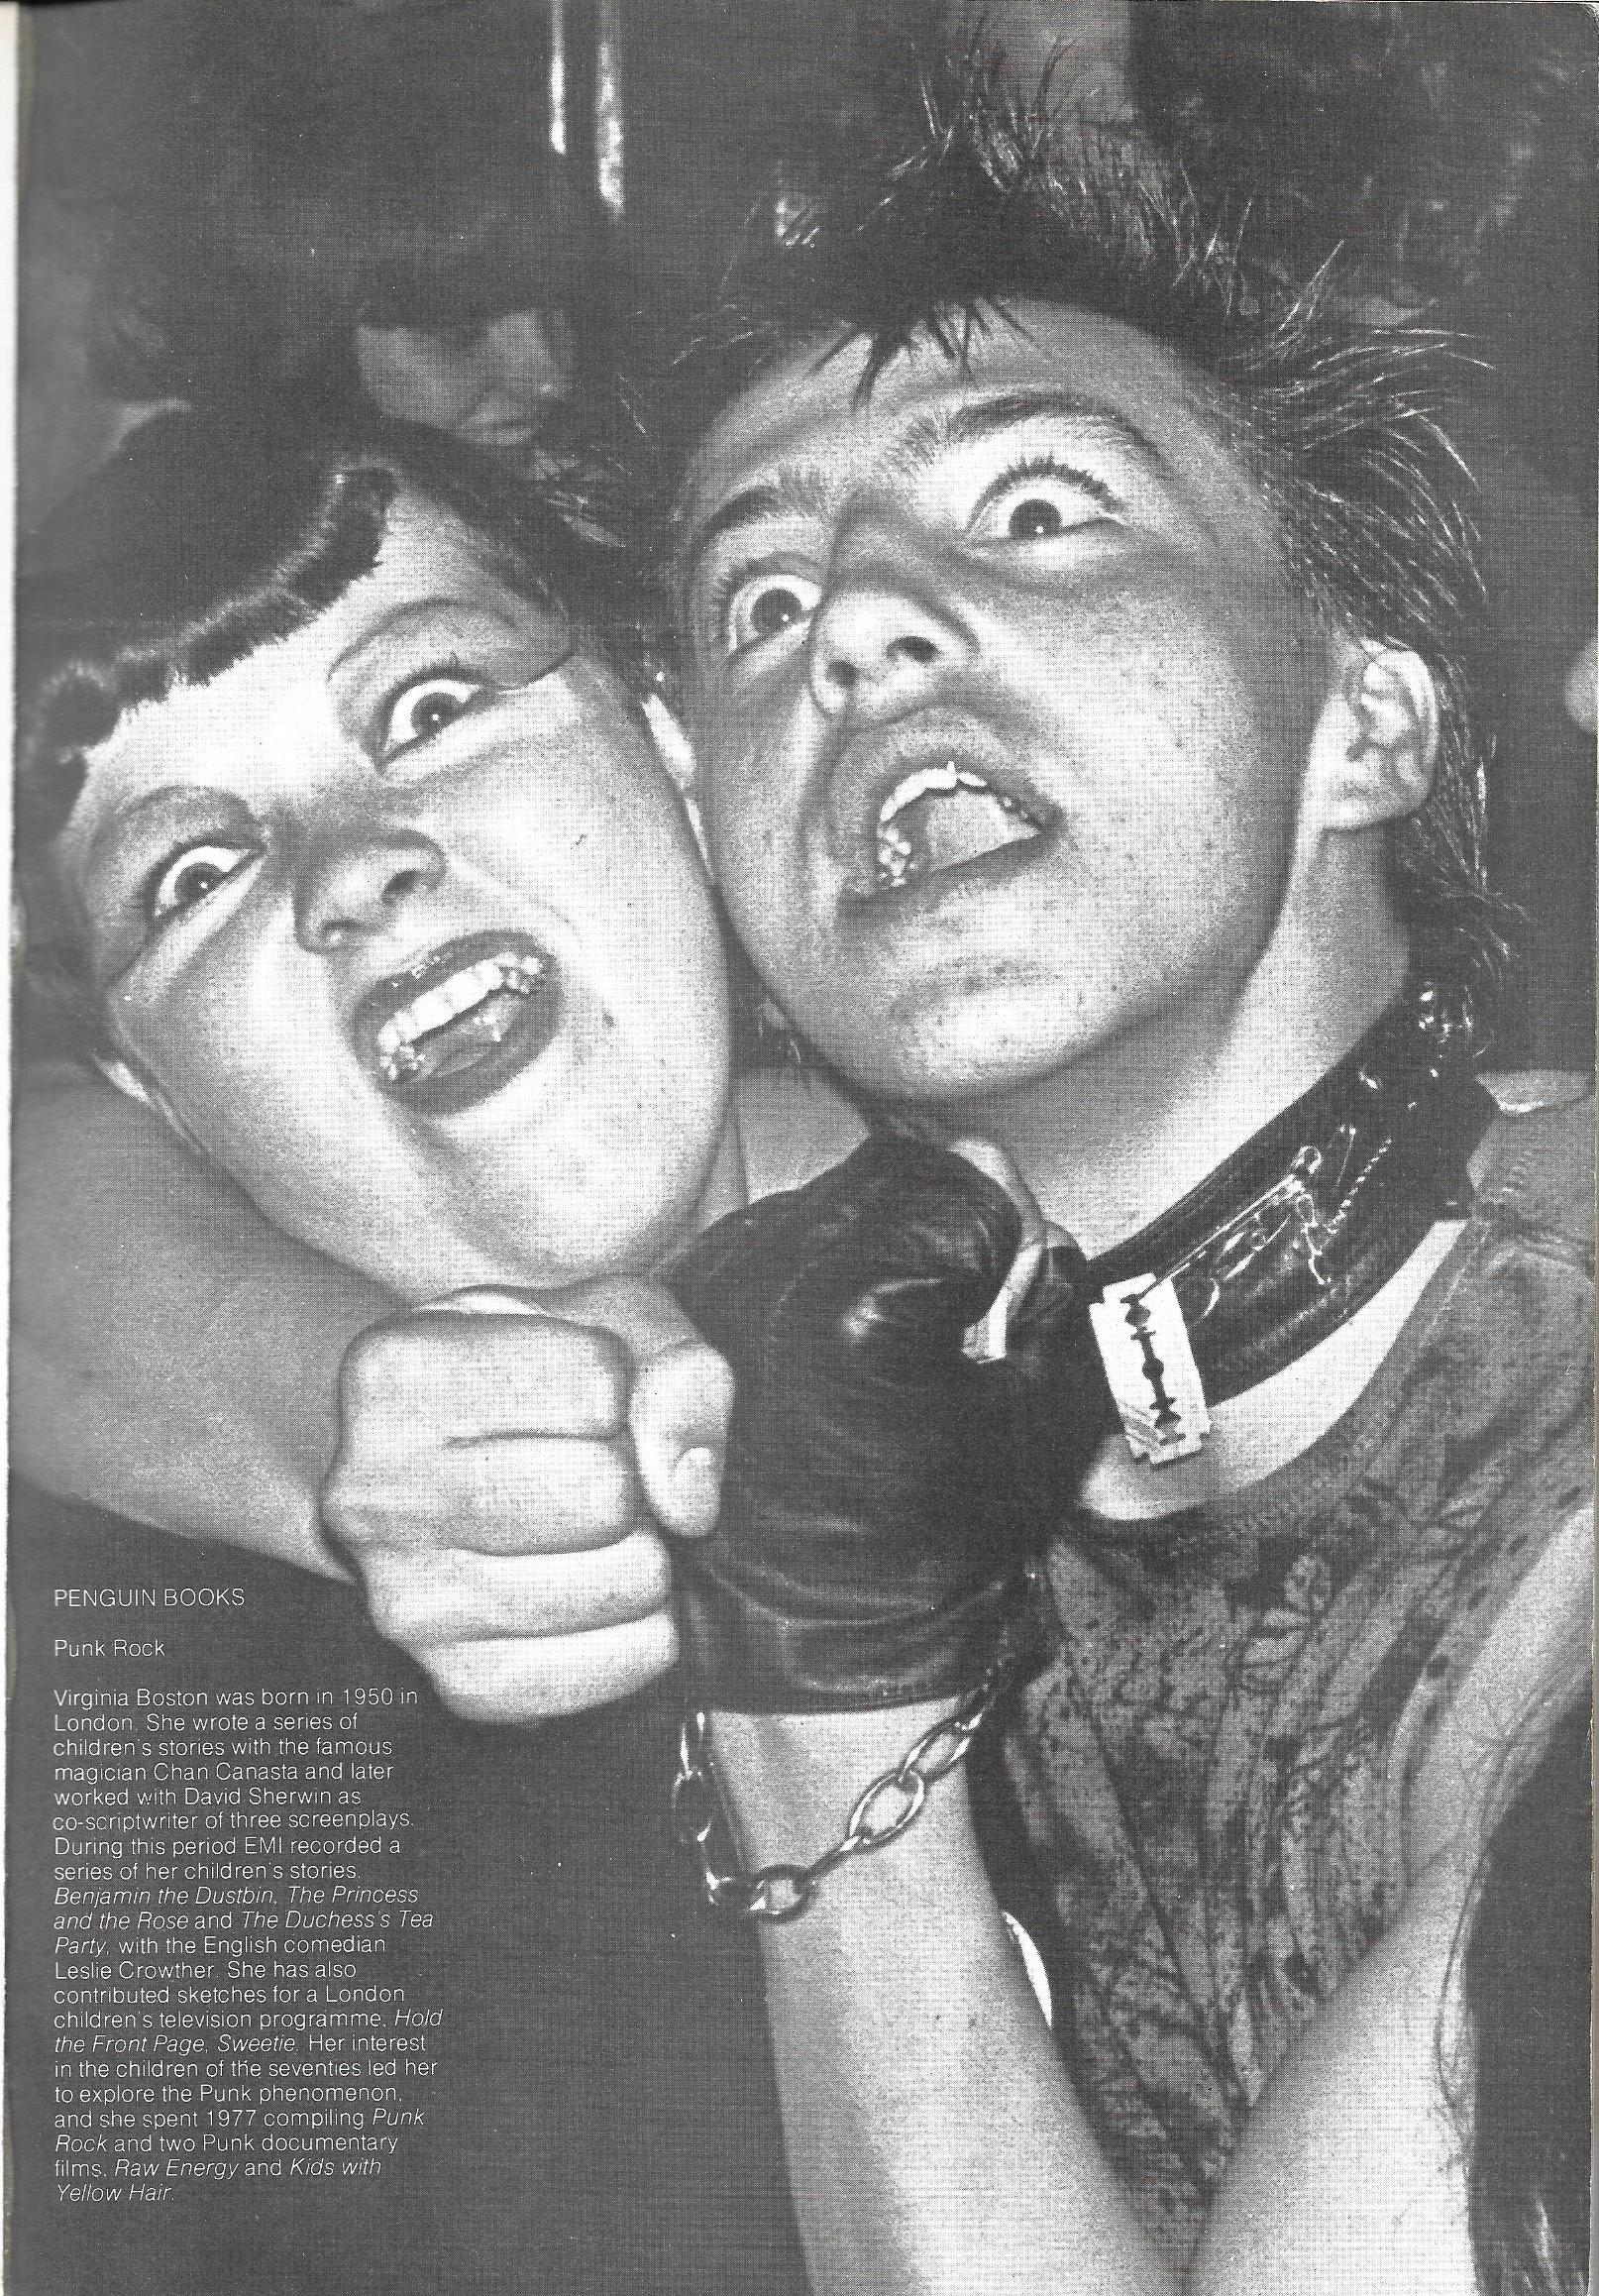 Punk Rock by VIrginia Boston 1978 - Inside Cover left - US Version.jpg